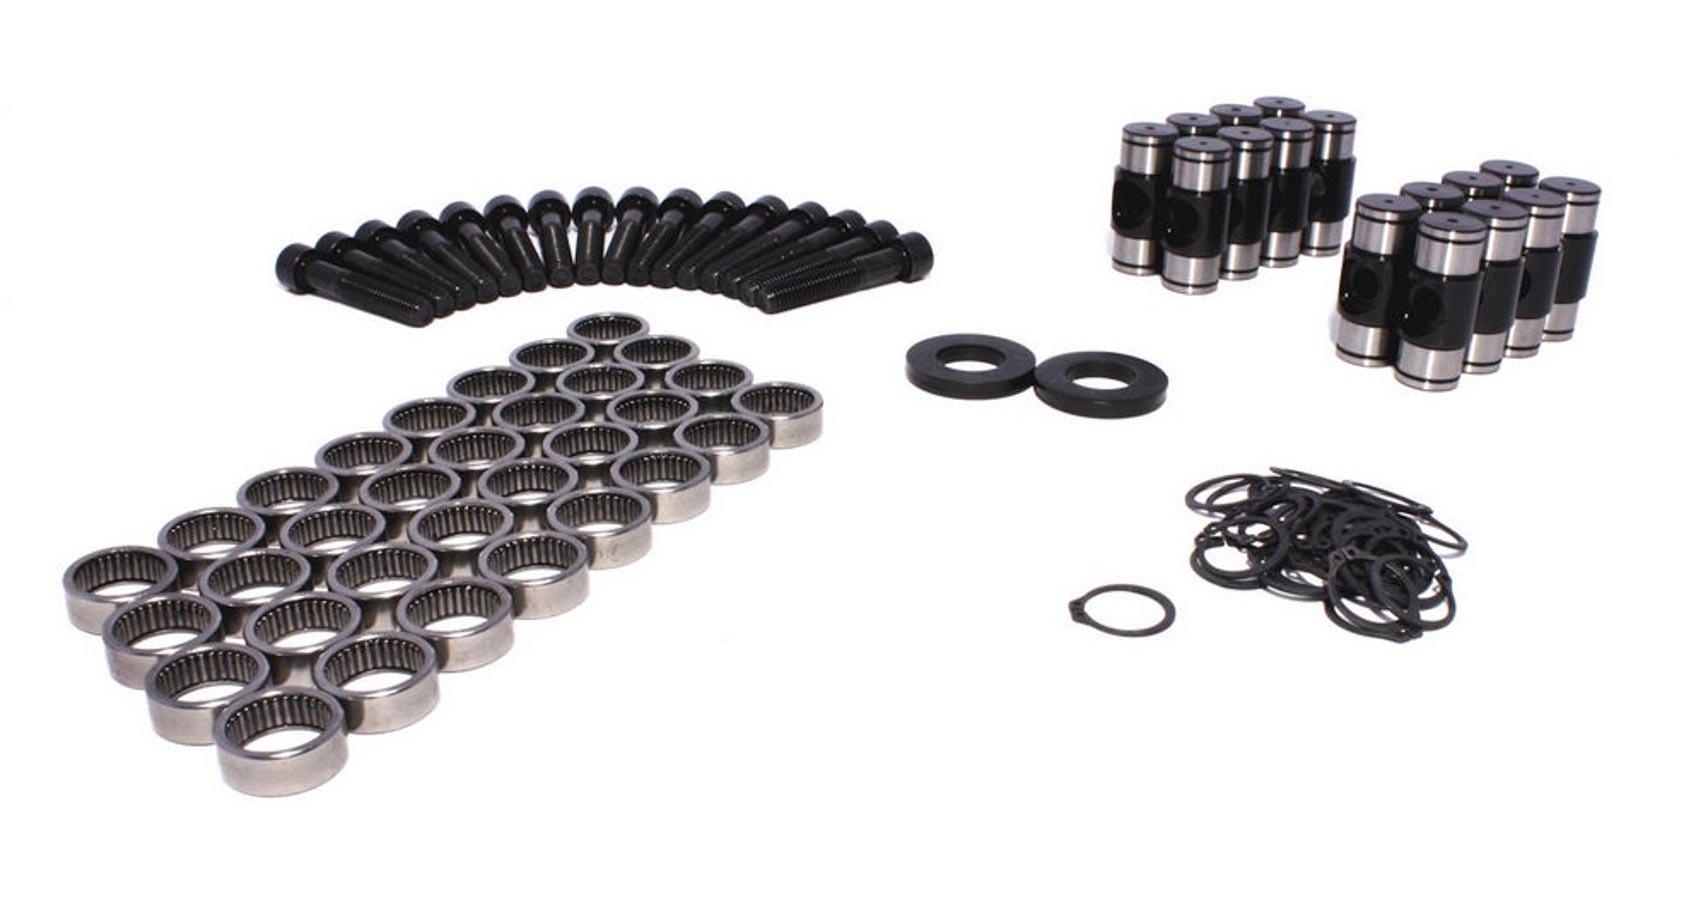 Comp Cams Trunion Kit - GM LS-Type Rocker Arm Retro-Fit